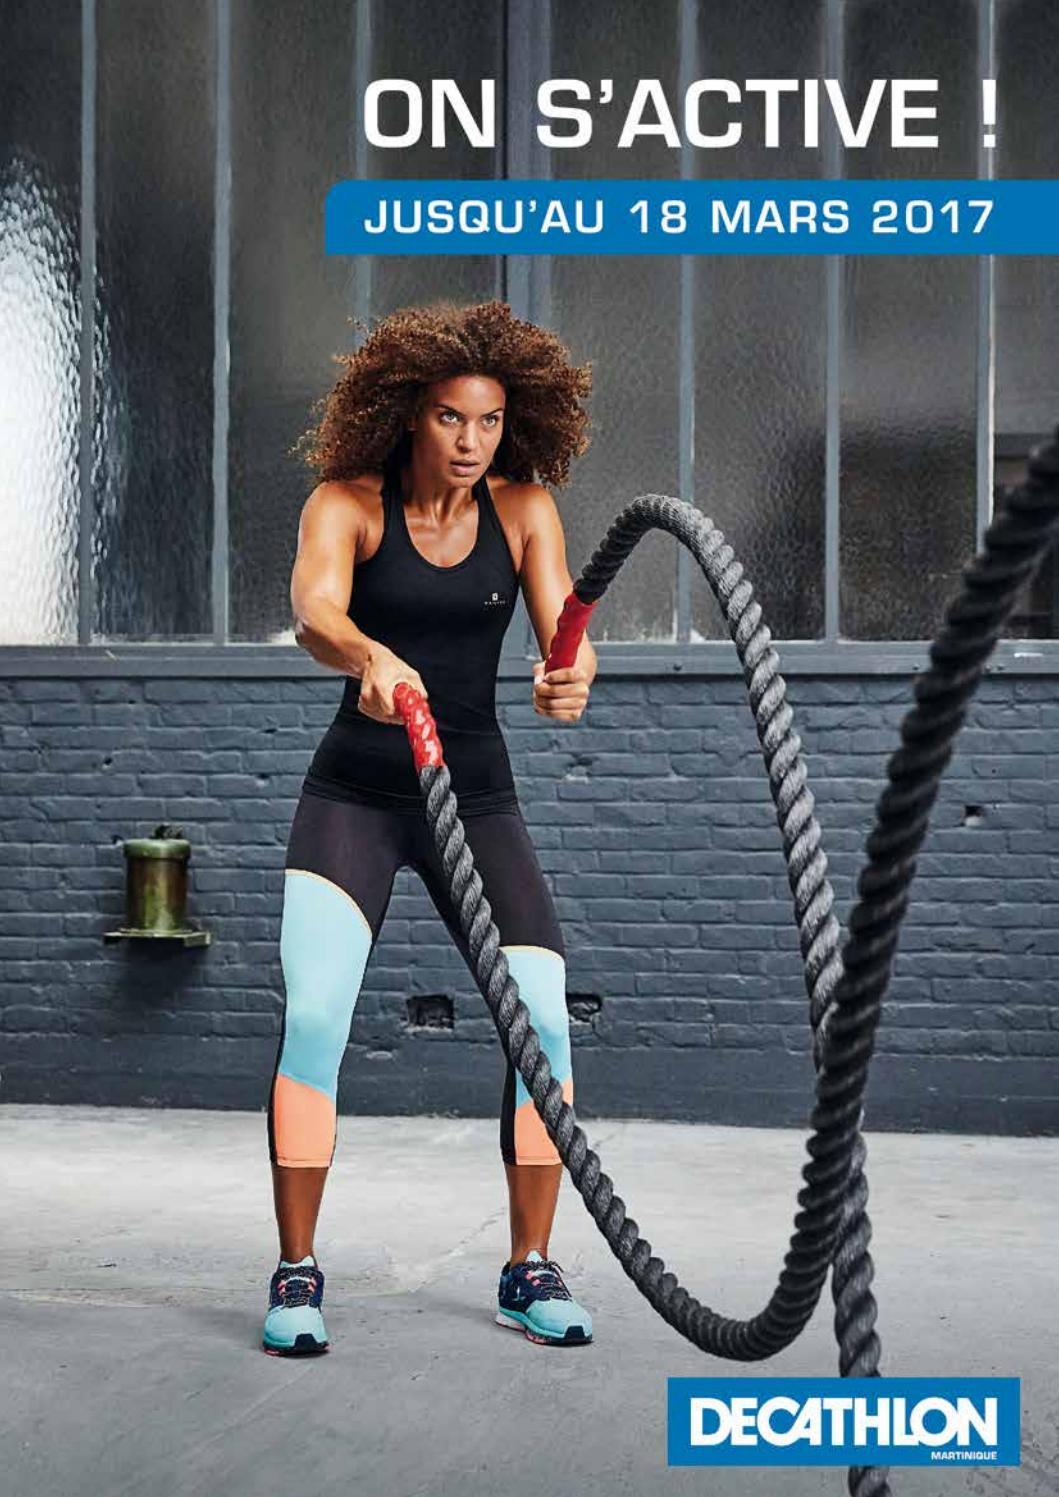 8465e671f DECATHLON Martinique   ON S ACTIVE ! (jusqu au 18 Mars 2017) by Momentum  Média - issuu